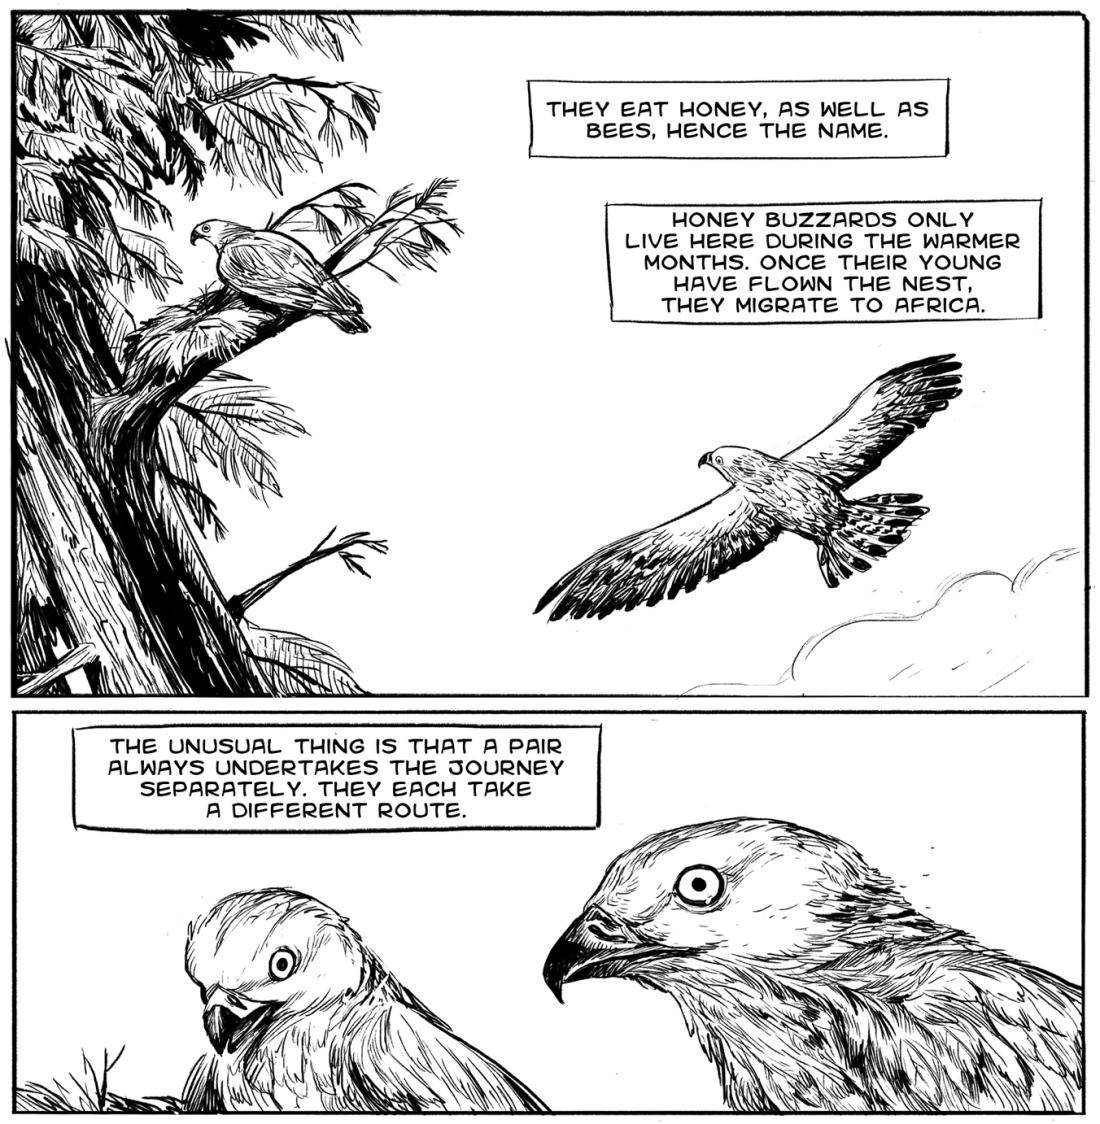 honeybuzzard_5